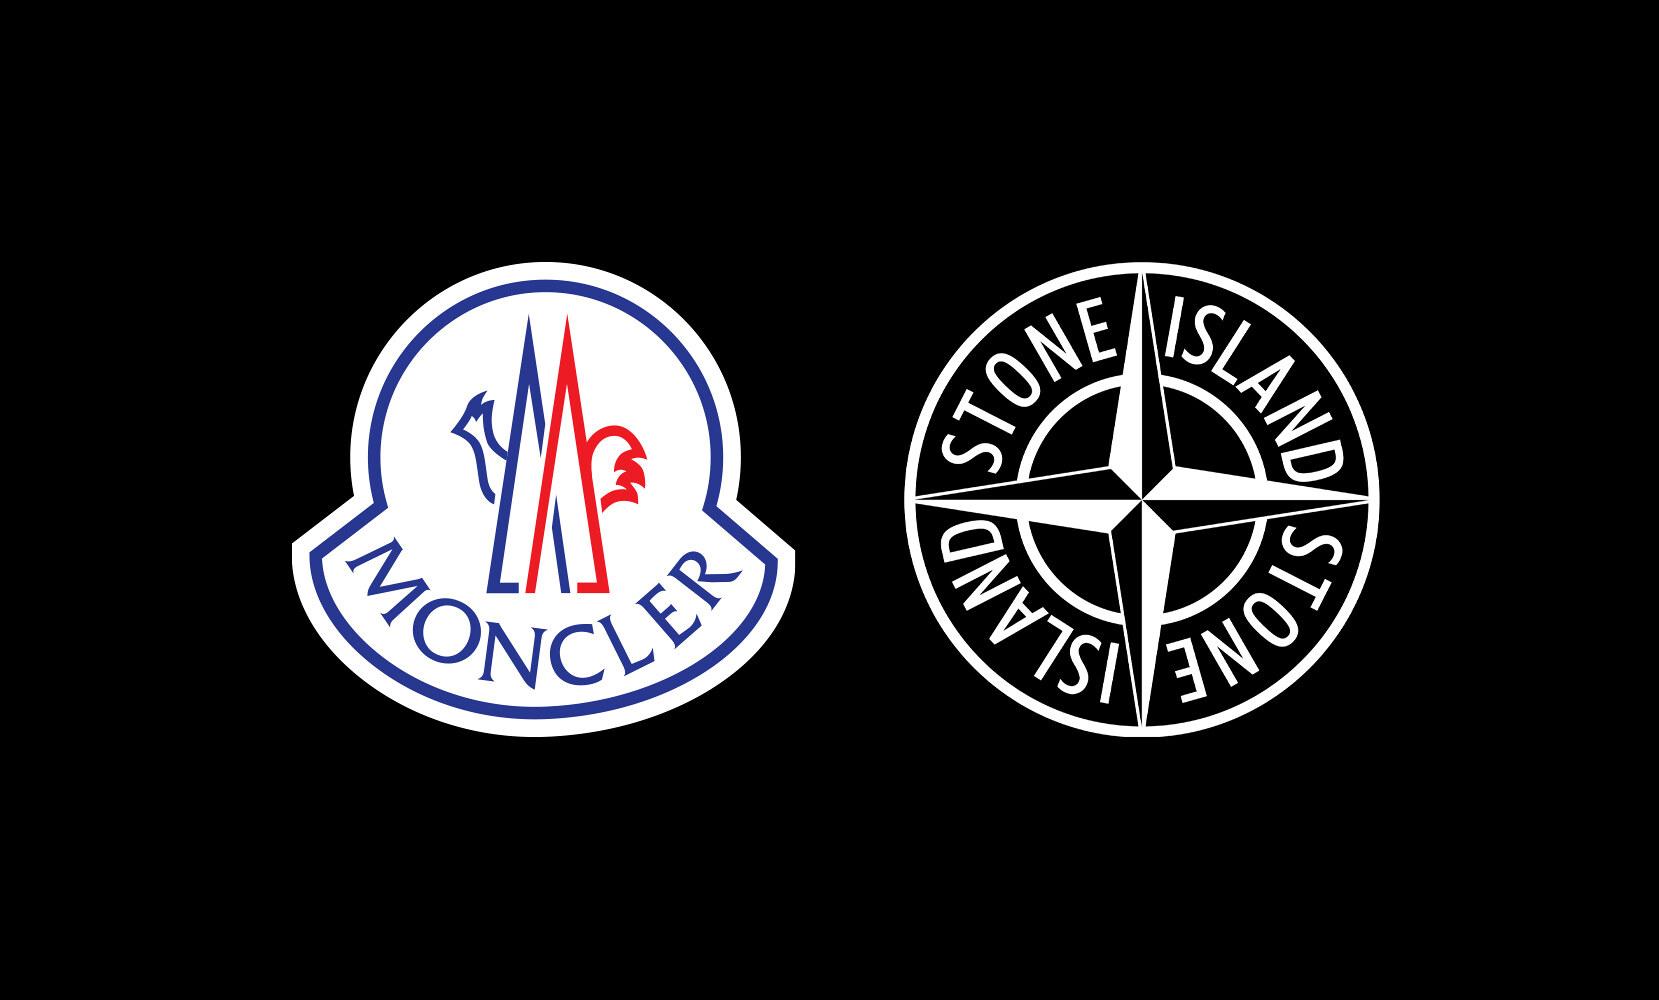 moncler stone island logo